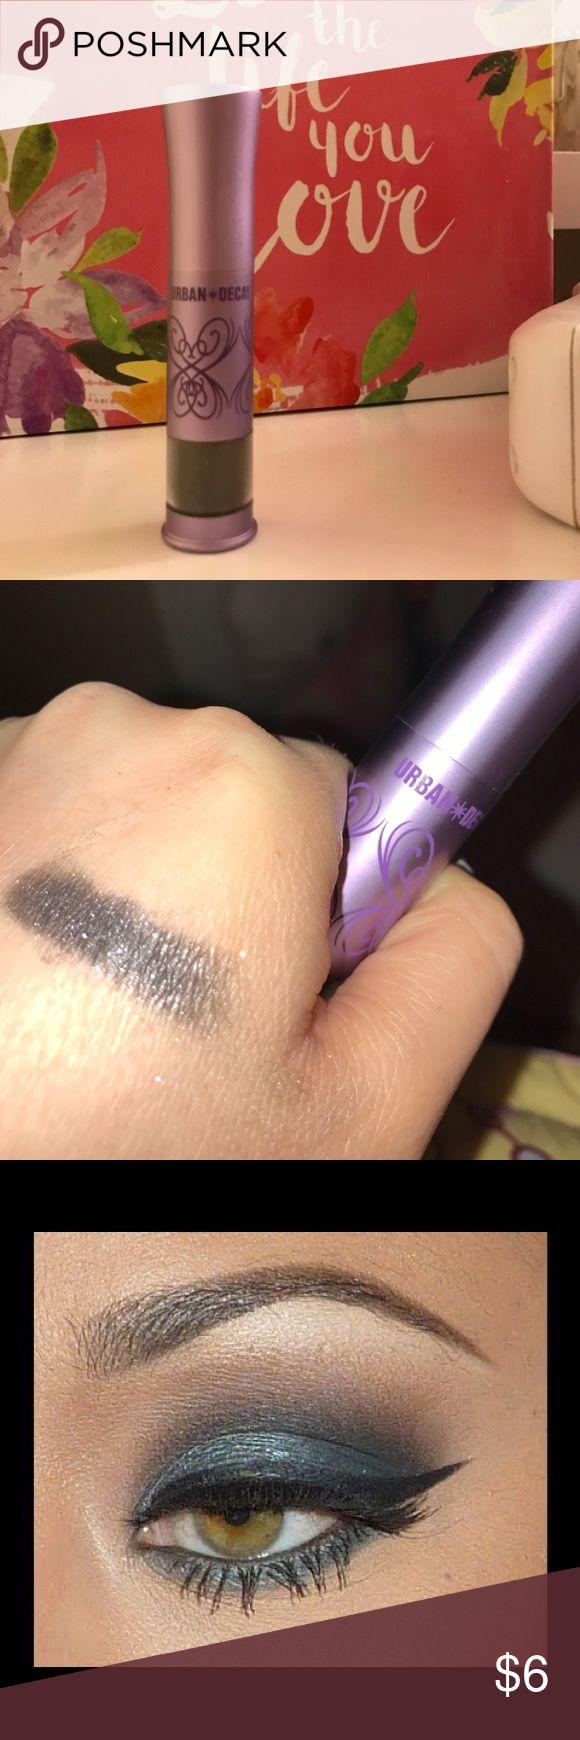 Urban decay loose powder shadow, shade gunmetal Used once to test; comes with brush; a dark gray loose powder shadow with hint of shimmer, perfect for smokey eye look Urban Decay Makeup Eyeshadow